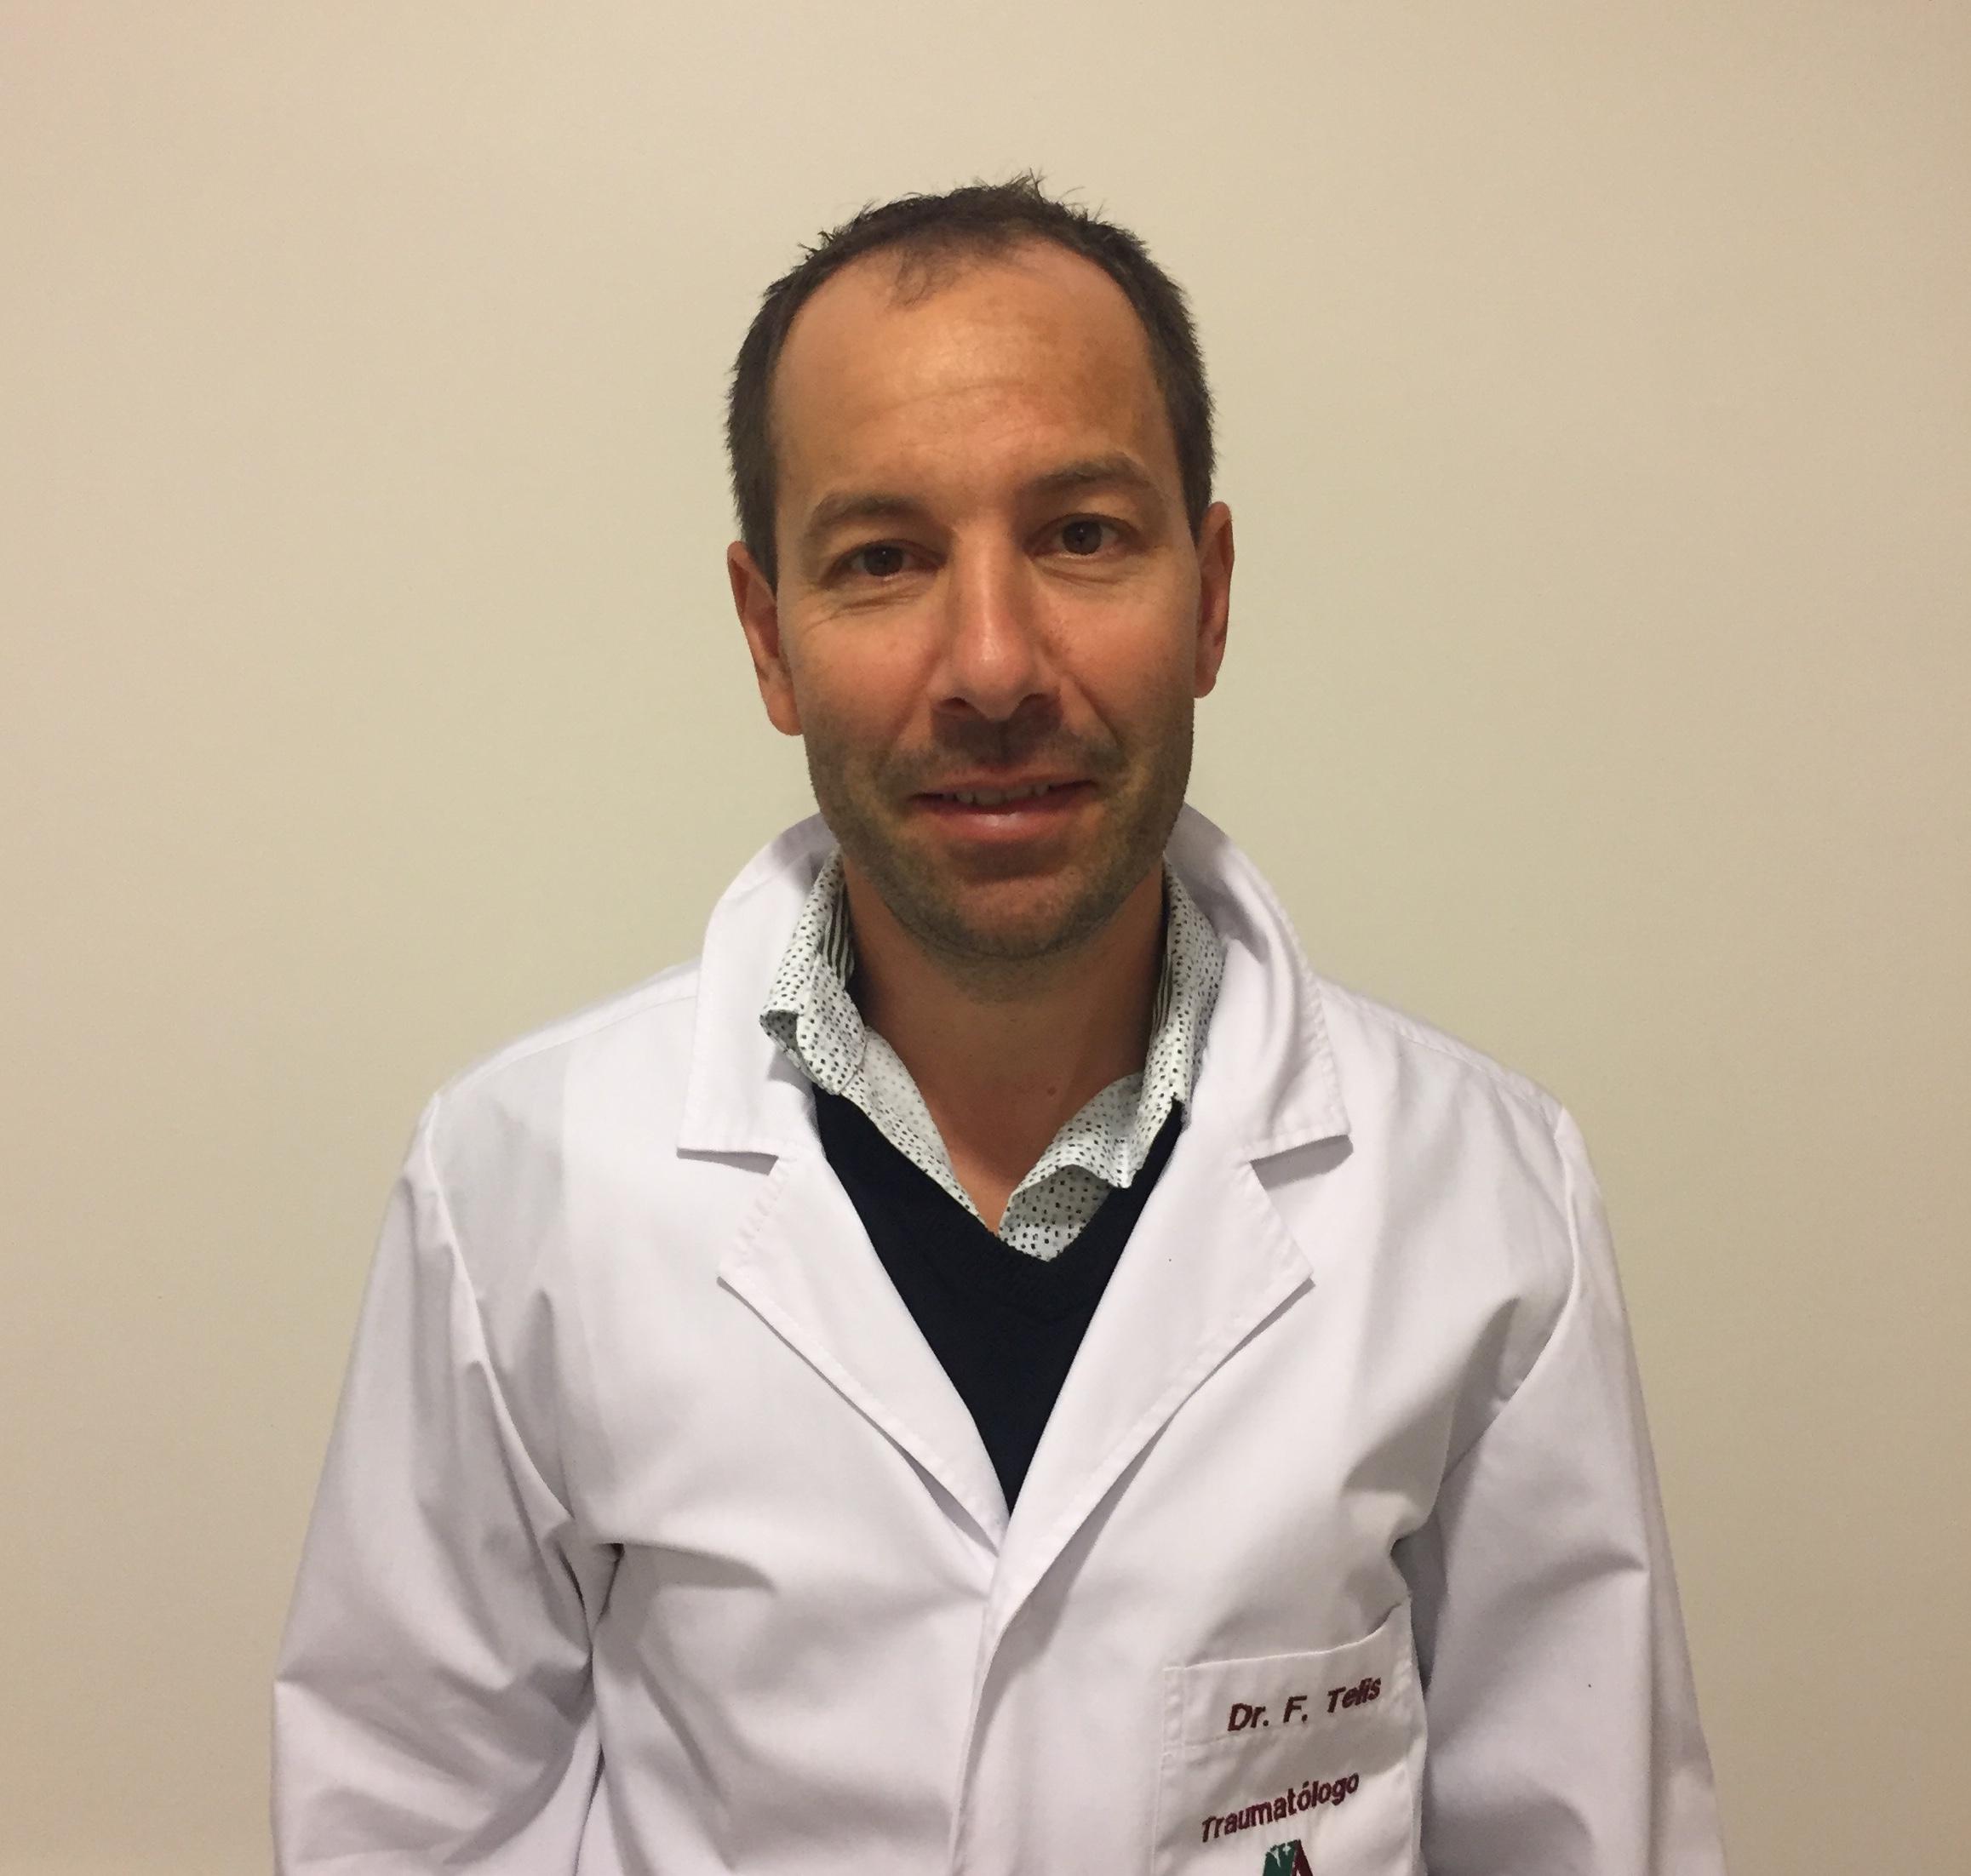 Dr. Telis Flavio